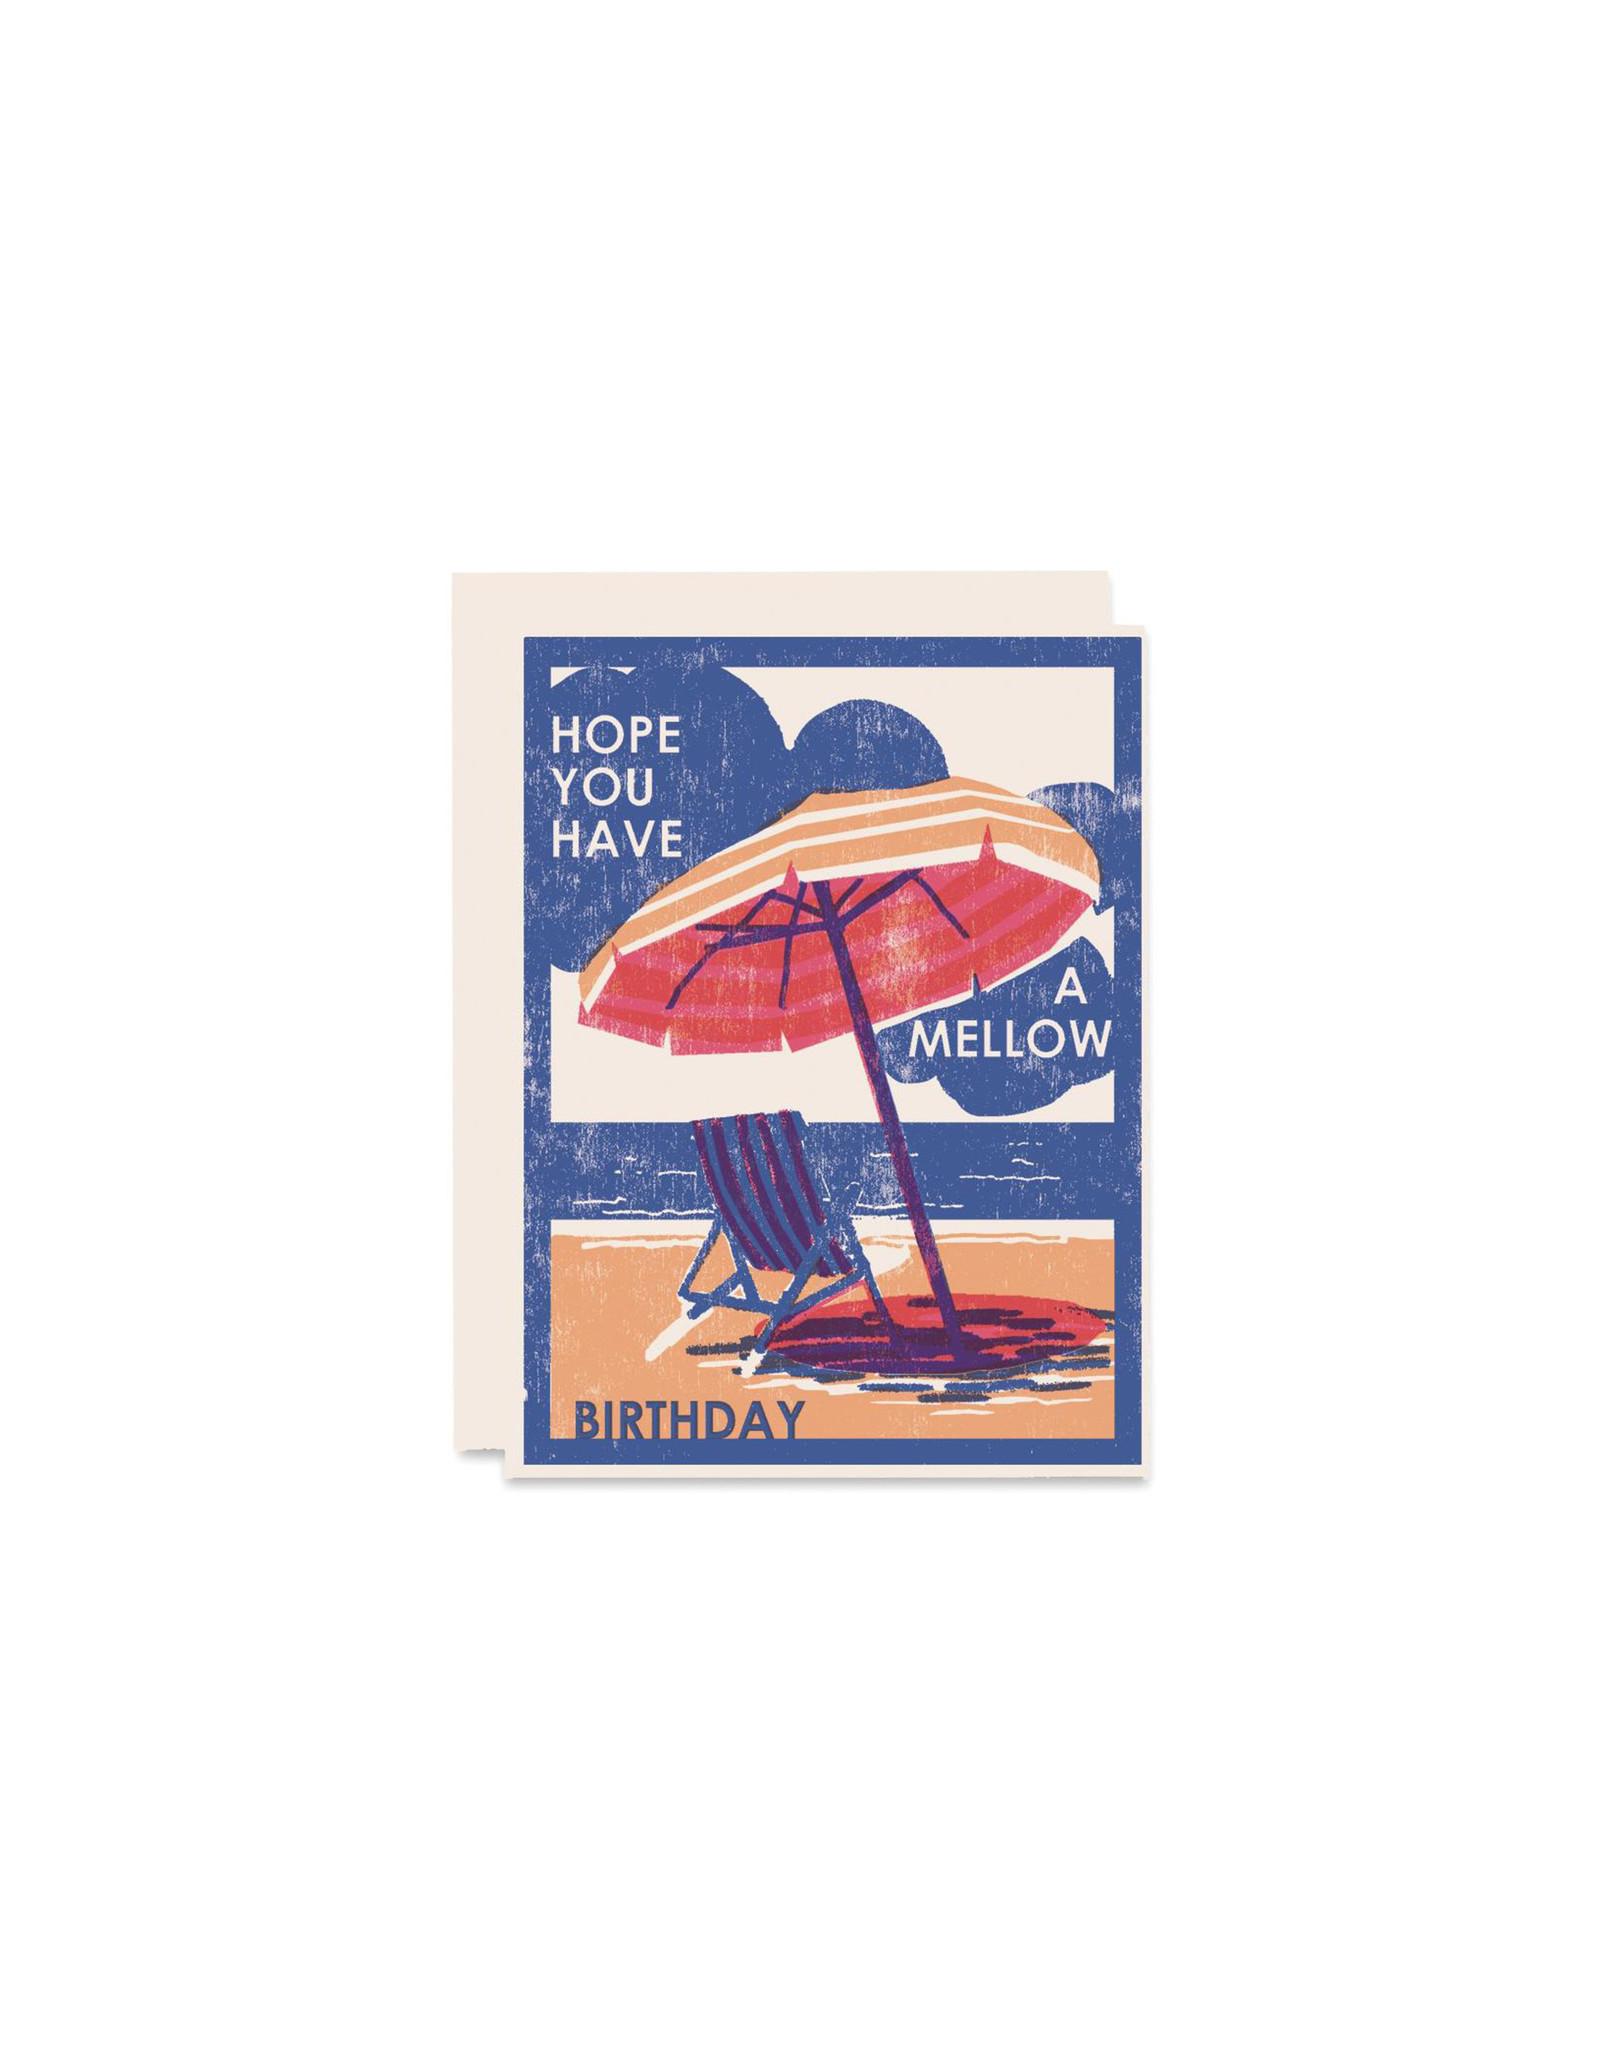 Heartell Press Mellow Birthday Card